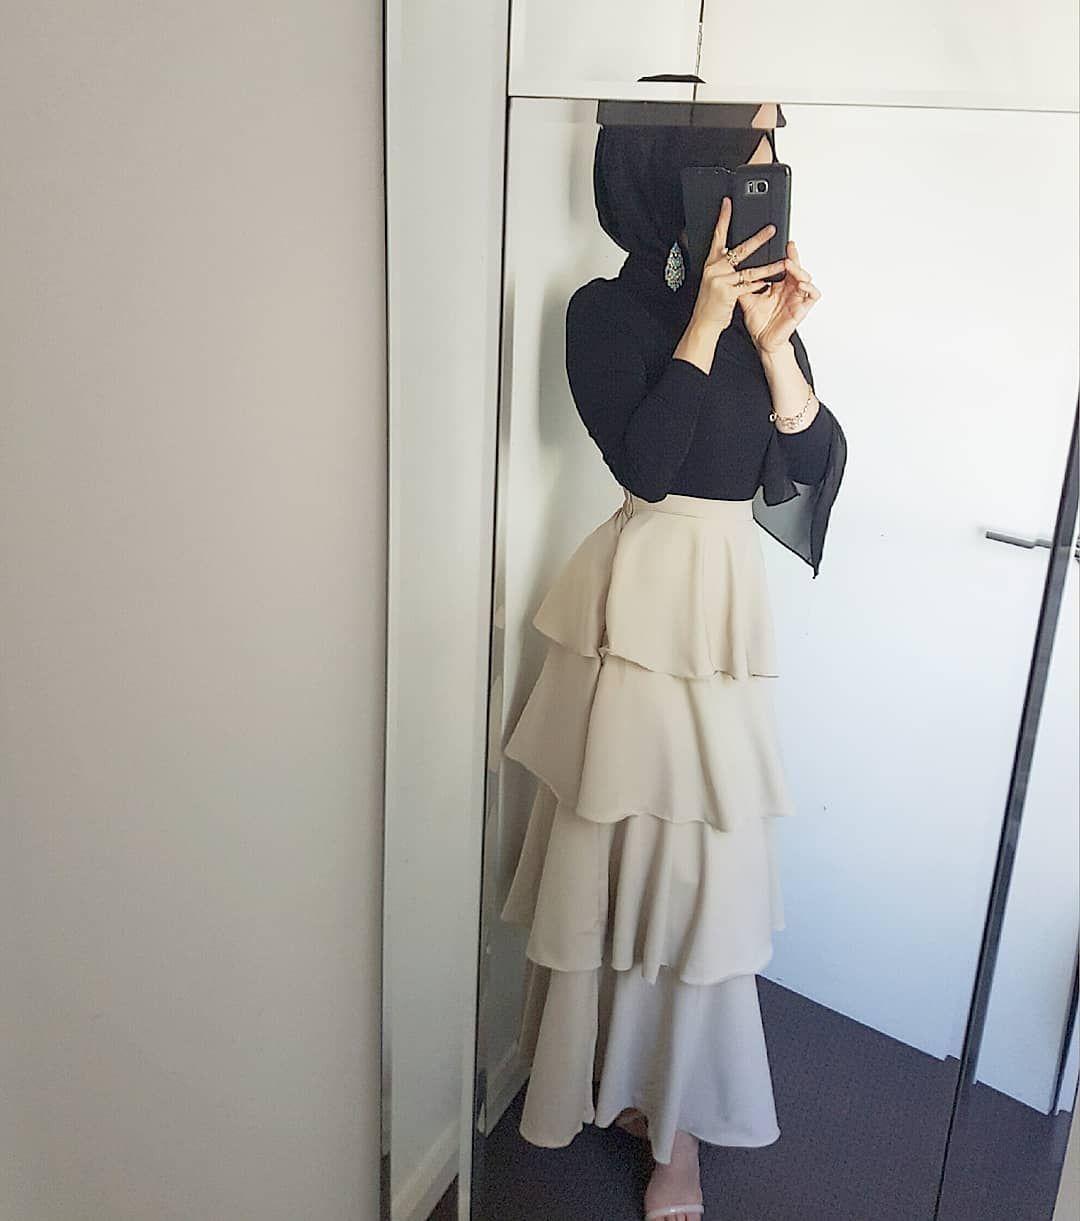 2 192 Likes 32 Comments Hijabrevivalofficial On Instagram Loving This Hijab House Dress Such A Femi Hijabi Fashion Hijab Fashion Muslim Fashion Outfits